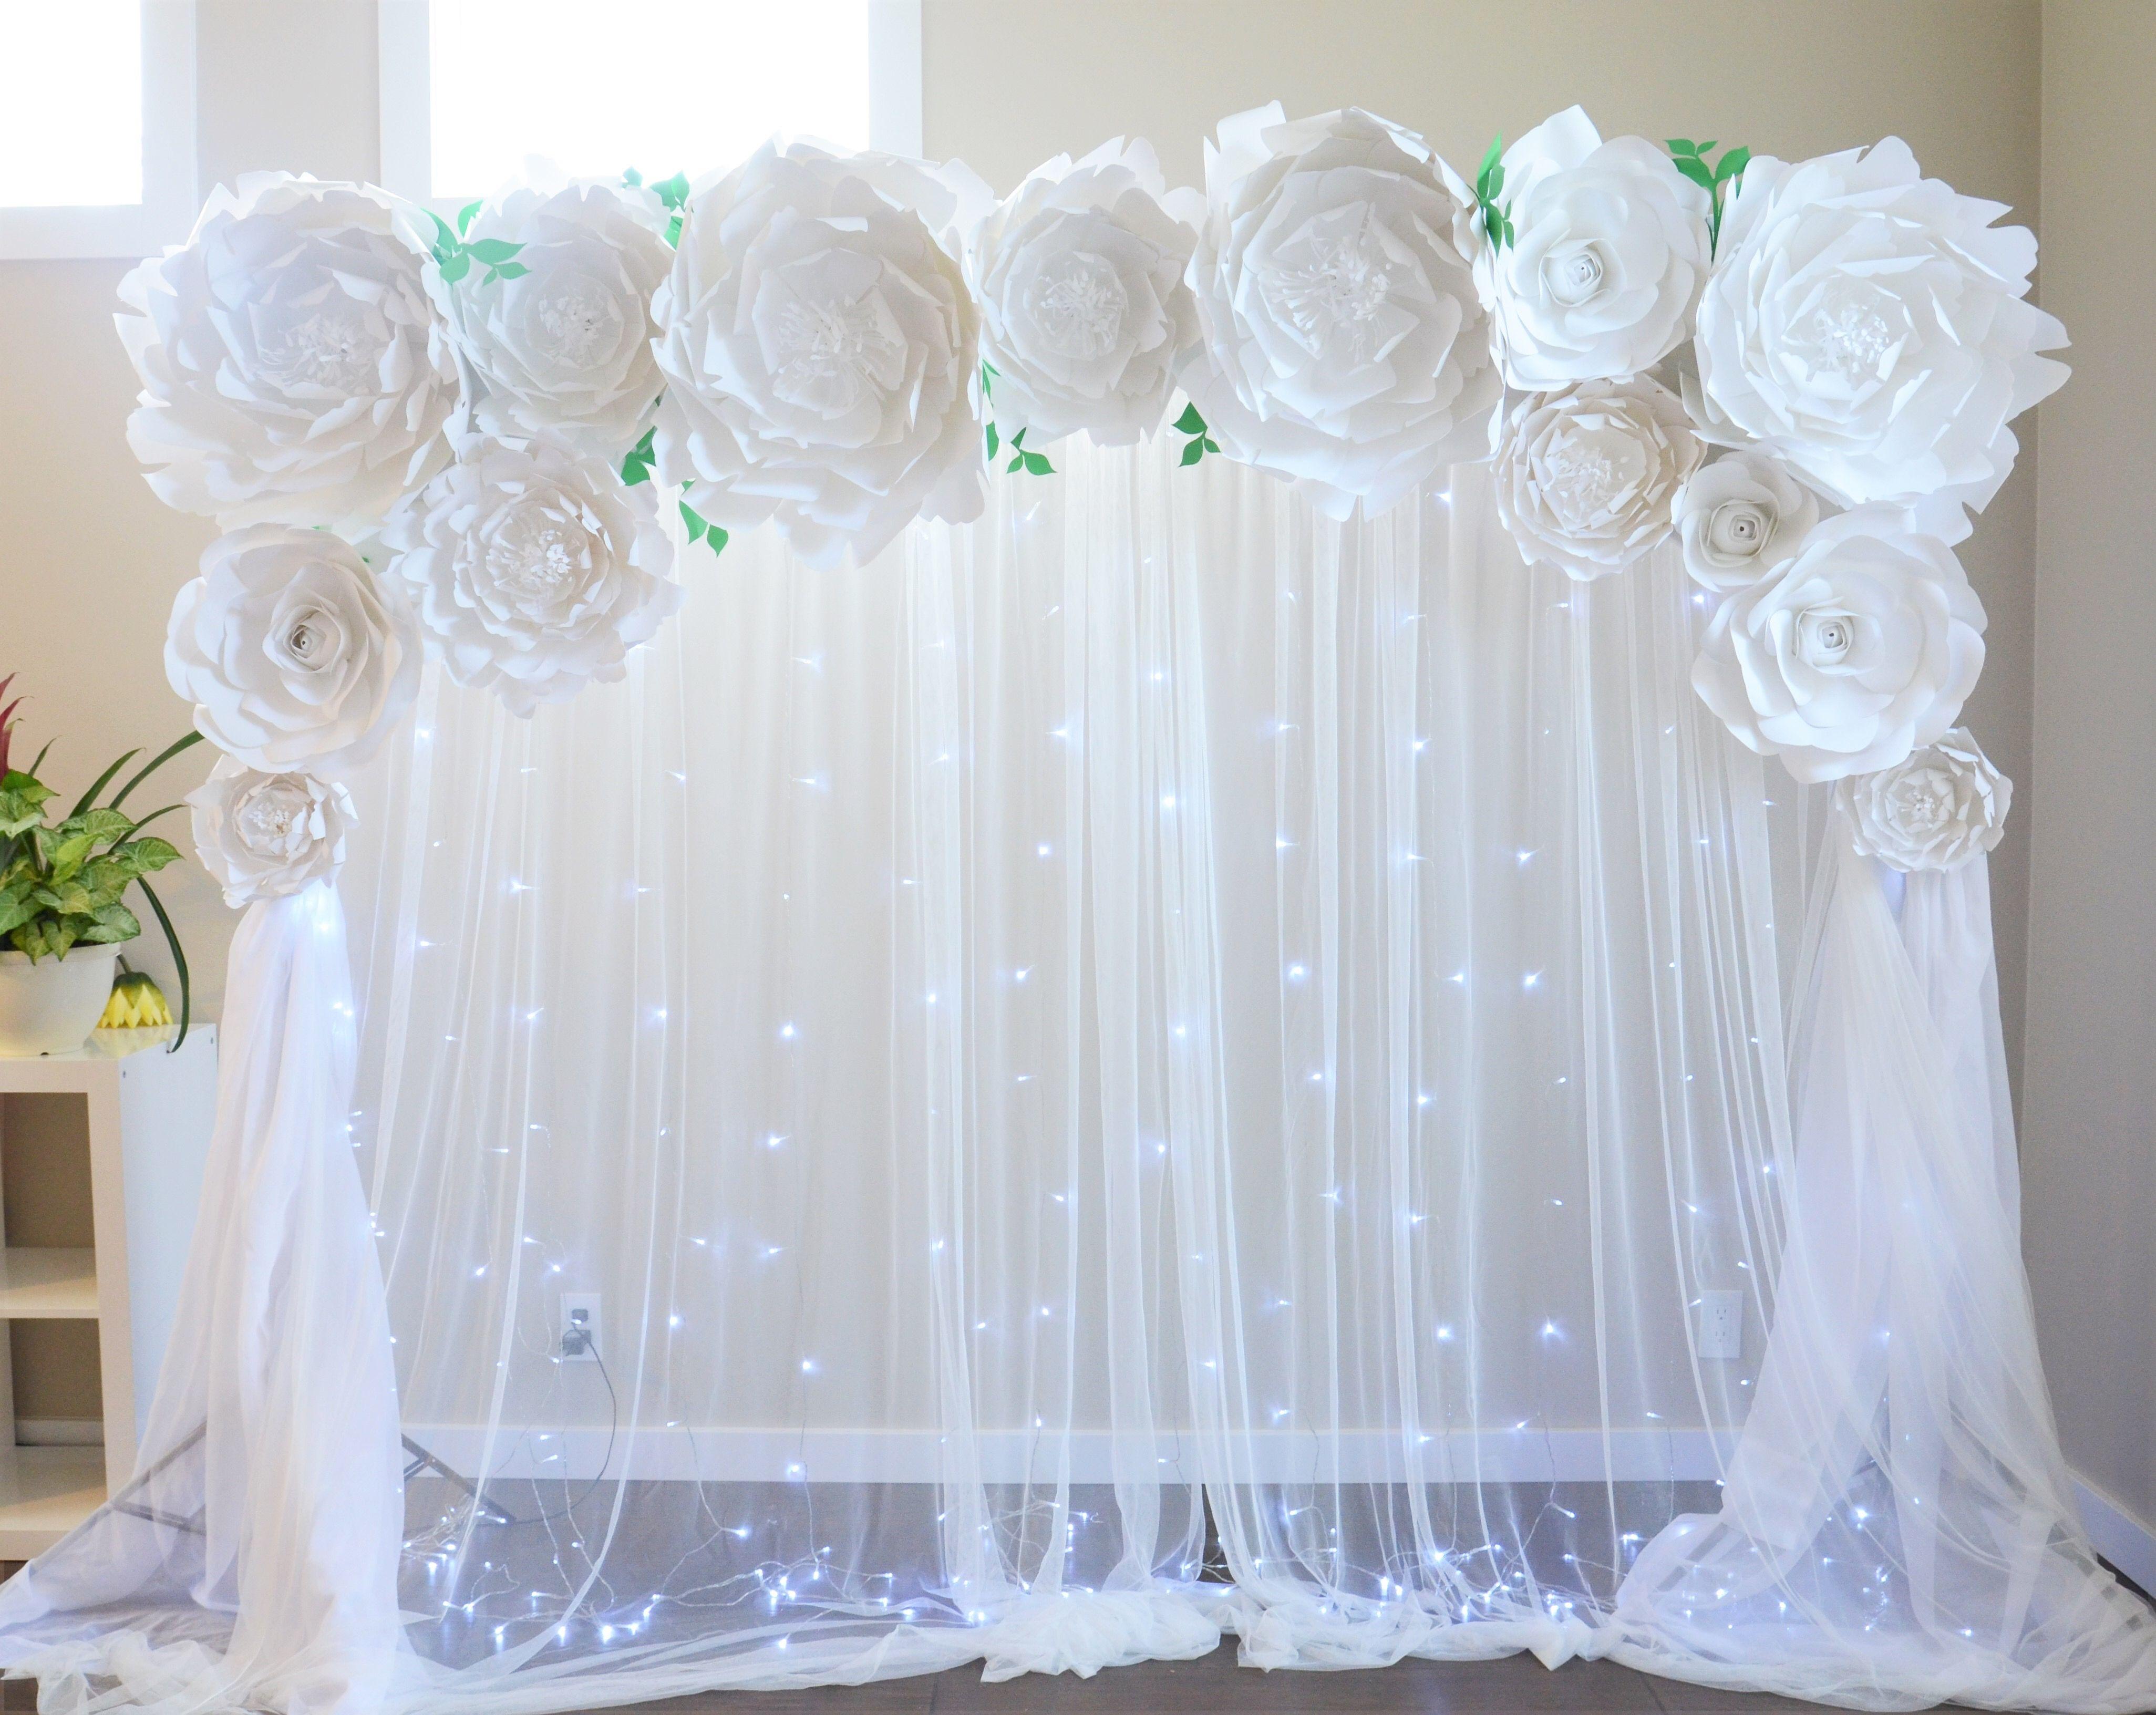 Wedding Backdrop By Seattle Giant Flowers Peony Backdrop